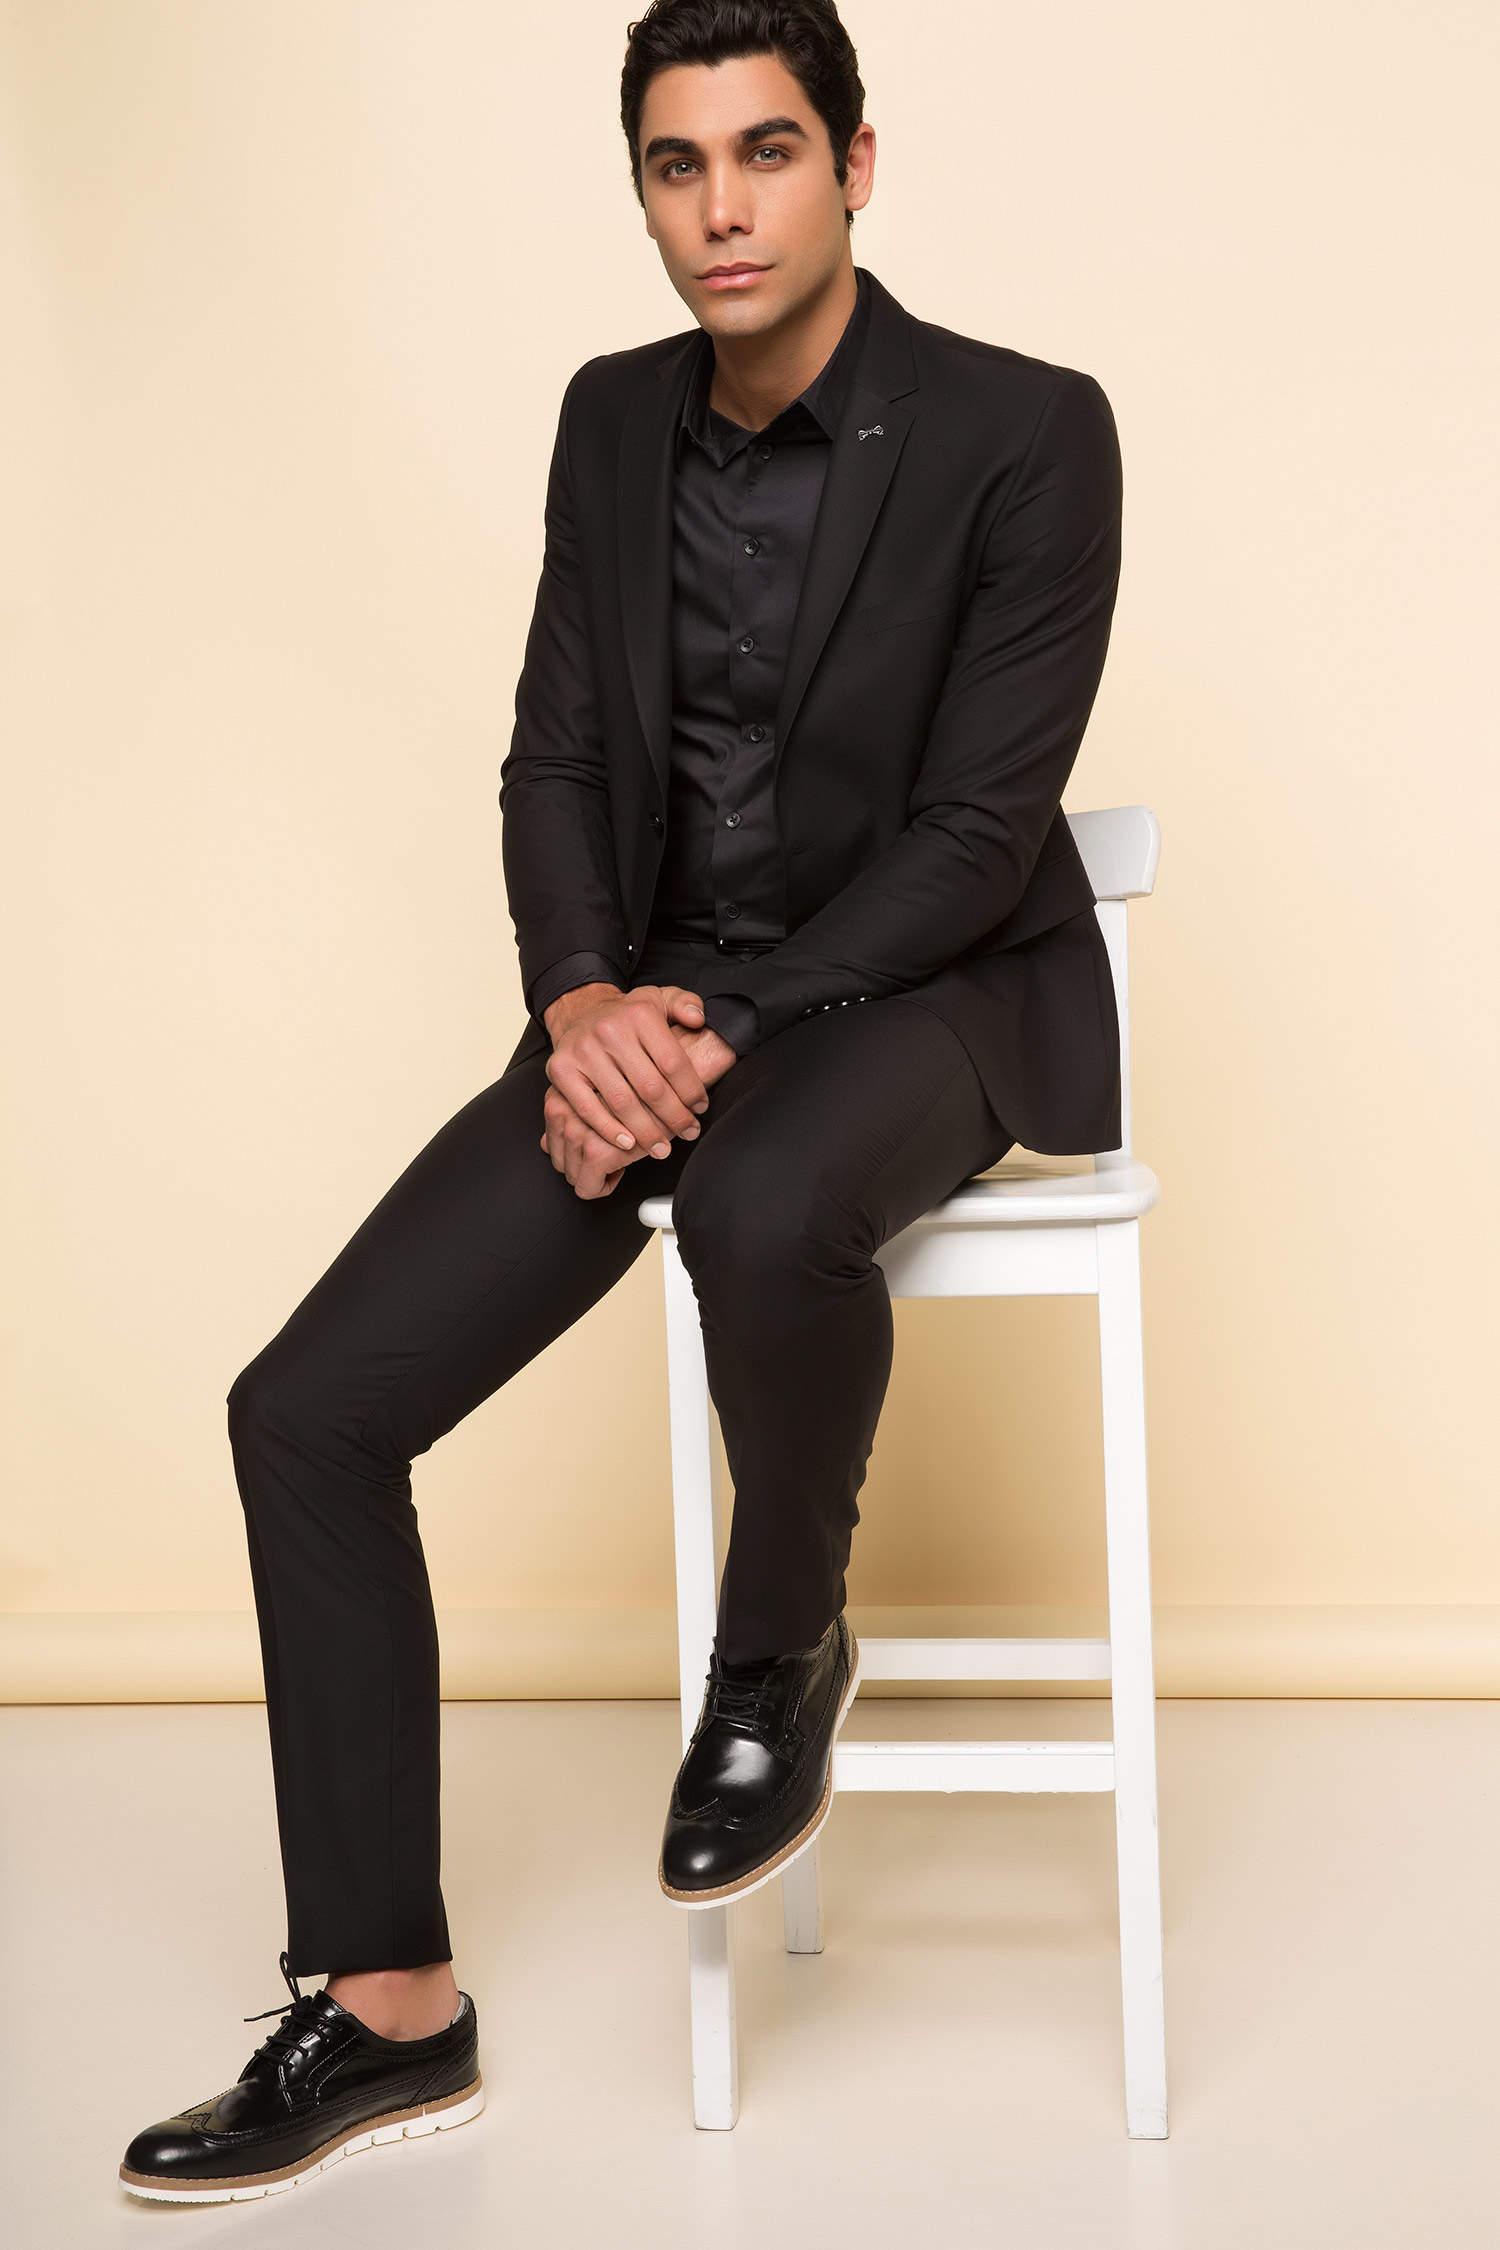 a0fa3353deb2a Siyah Erkek Takım Elbise 751057 | DeFacto